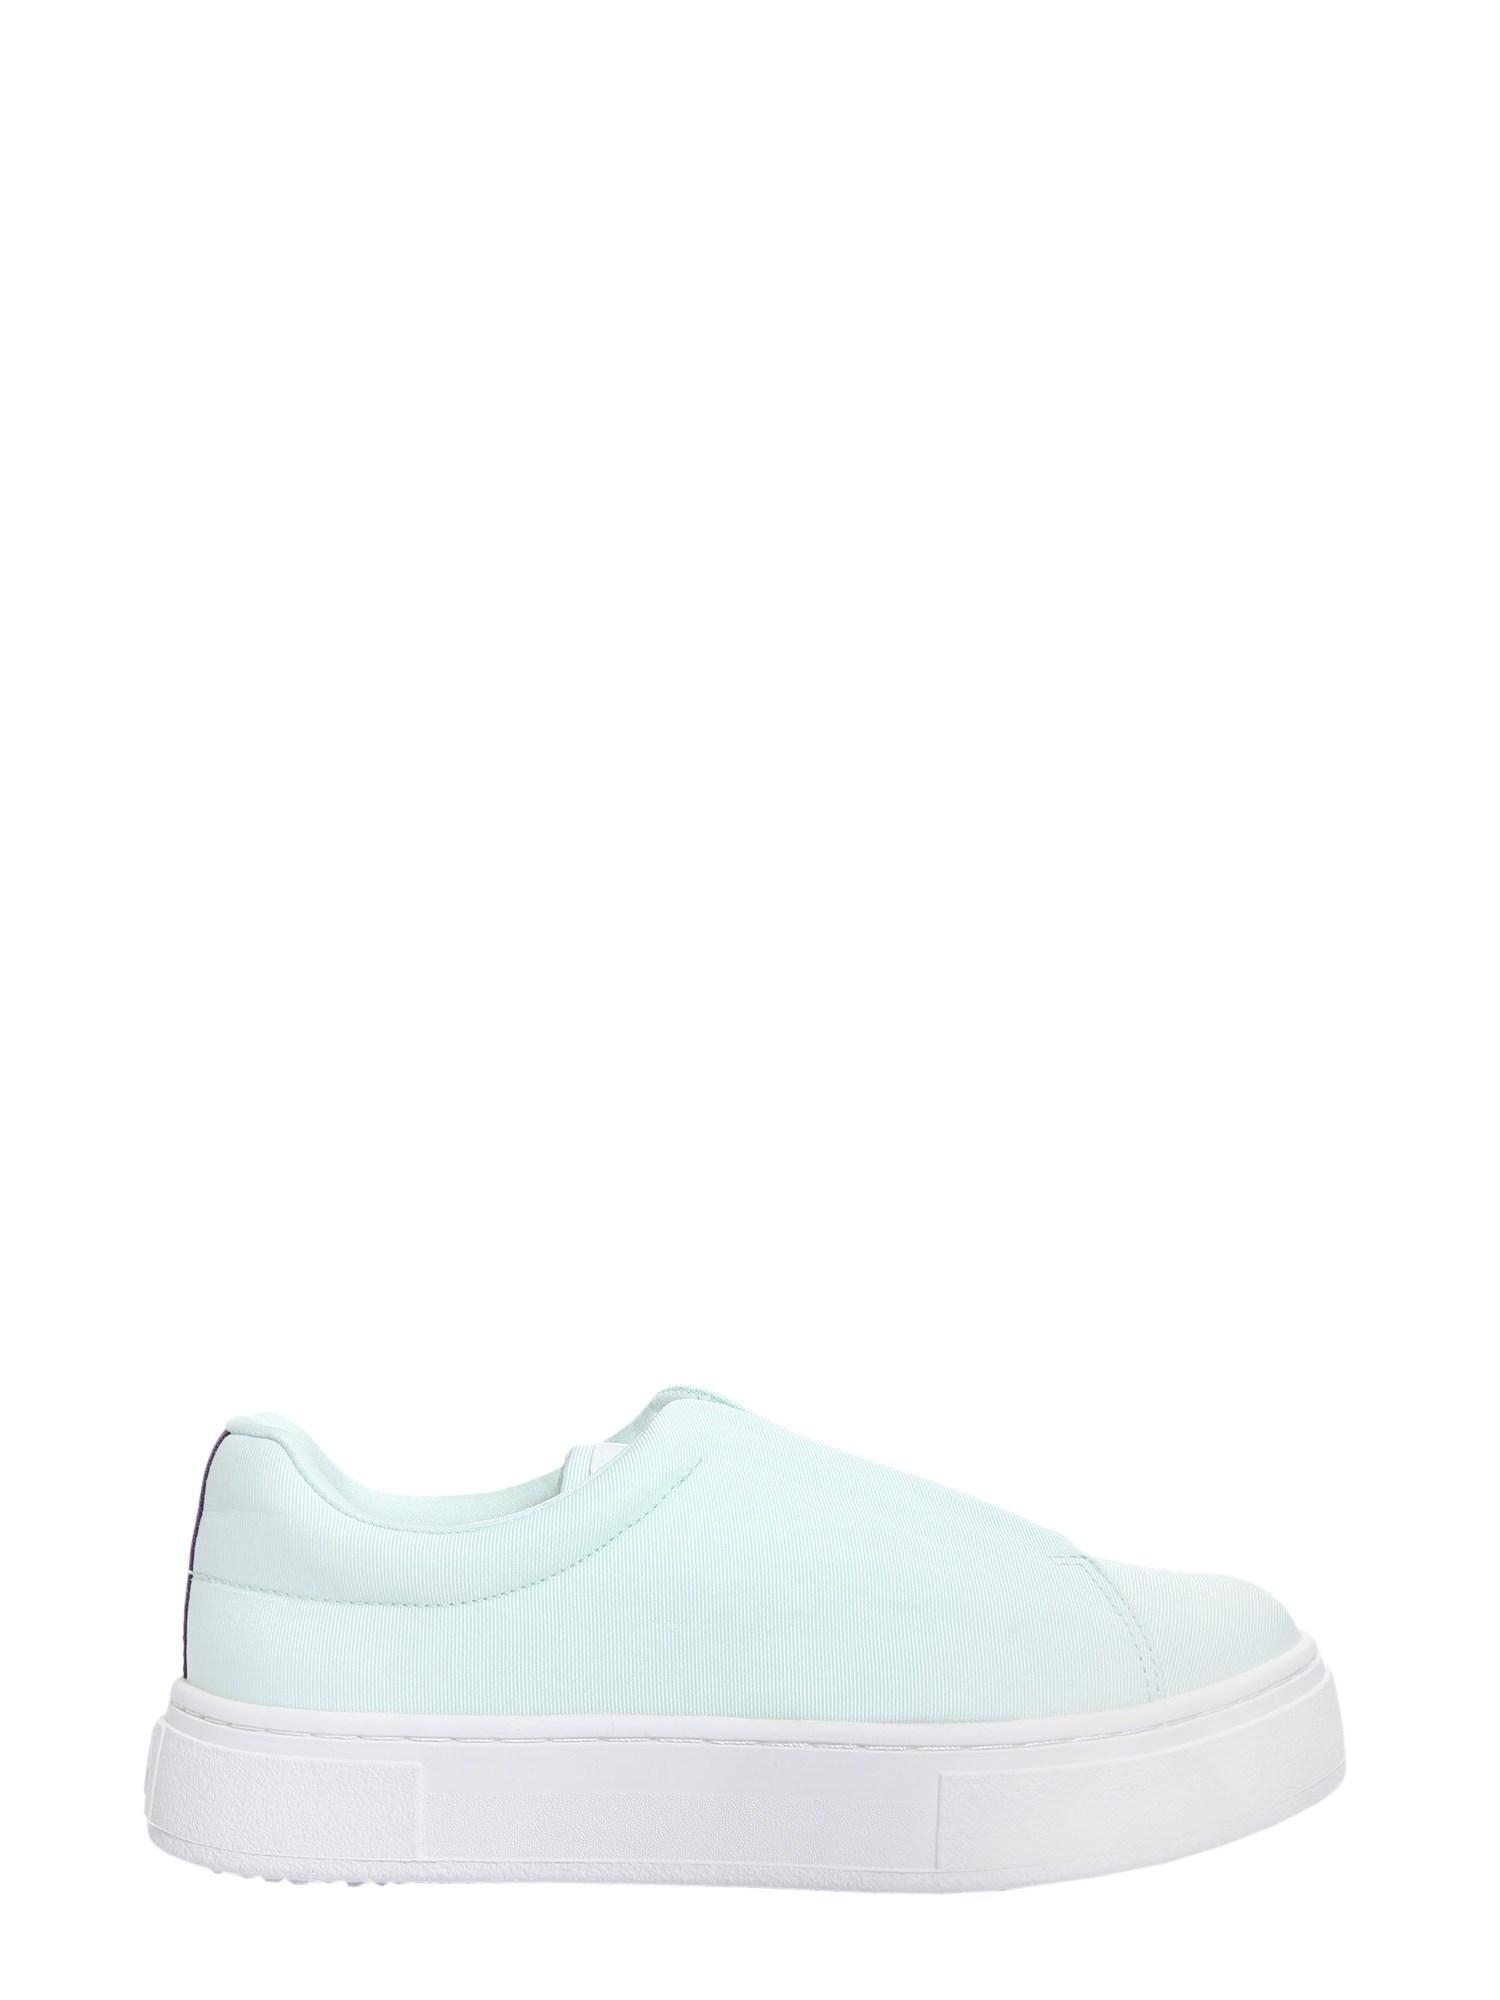 Eytys Doja So Canvas Sneakers in Azure (Blue)